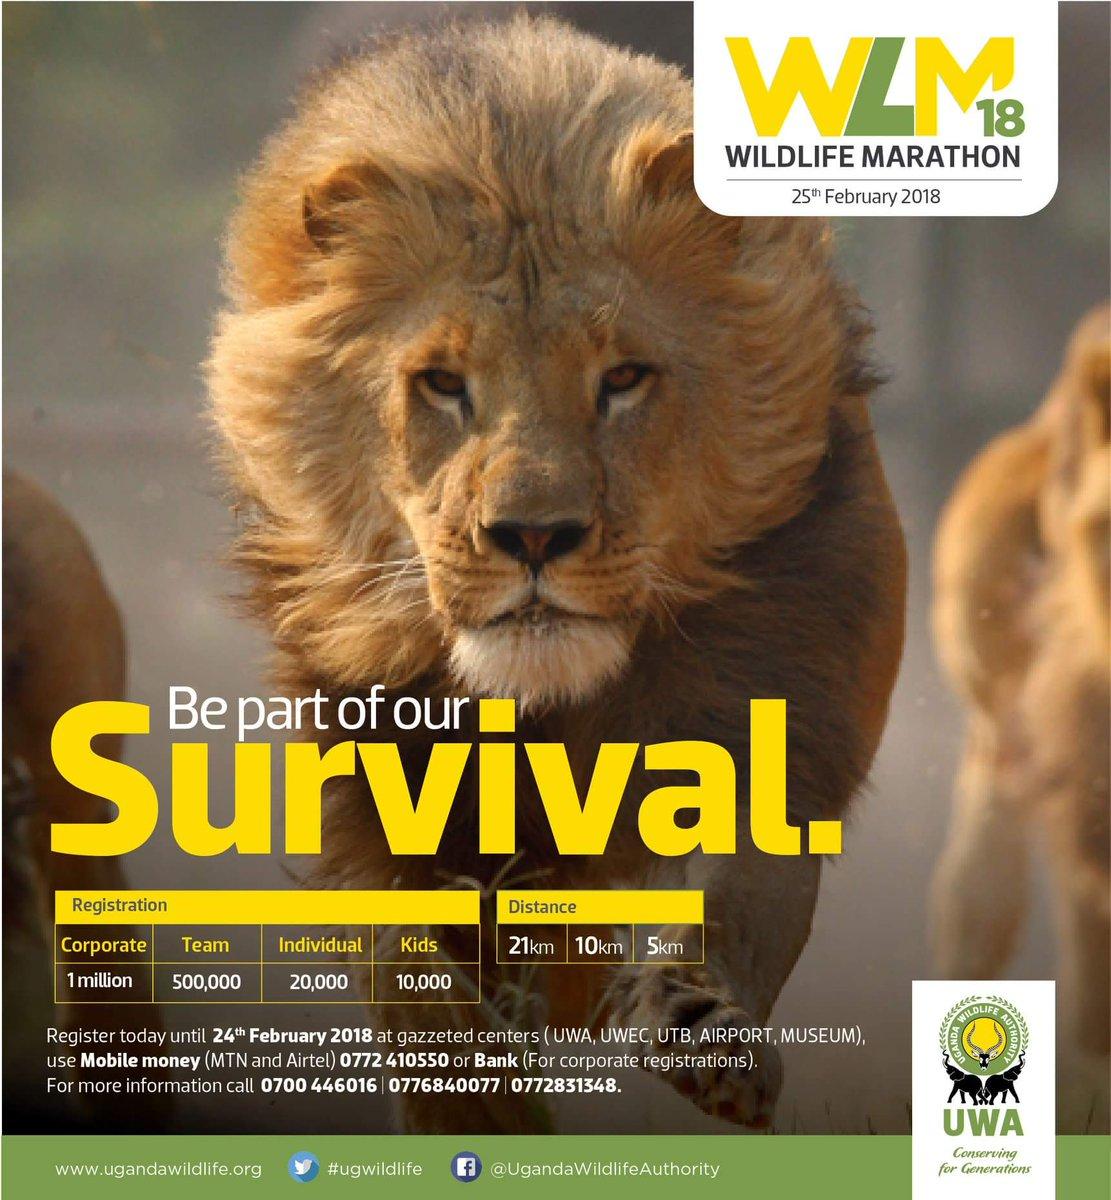 wildlife marathon